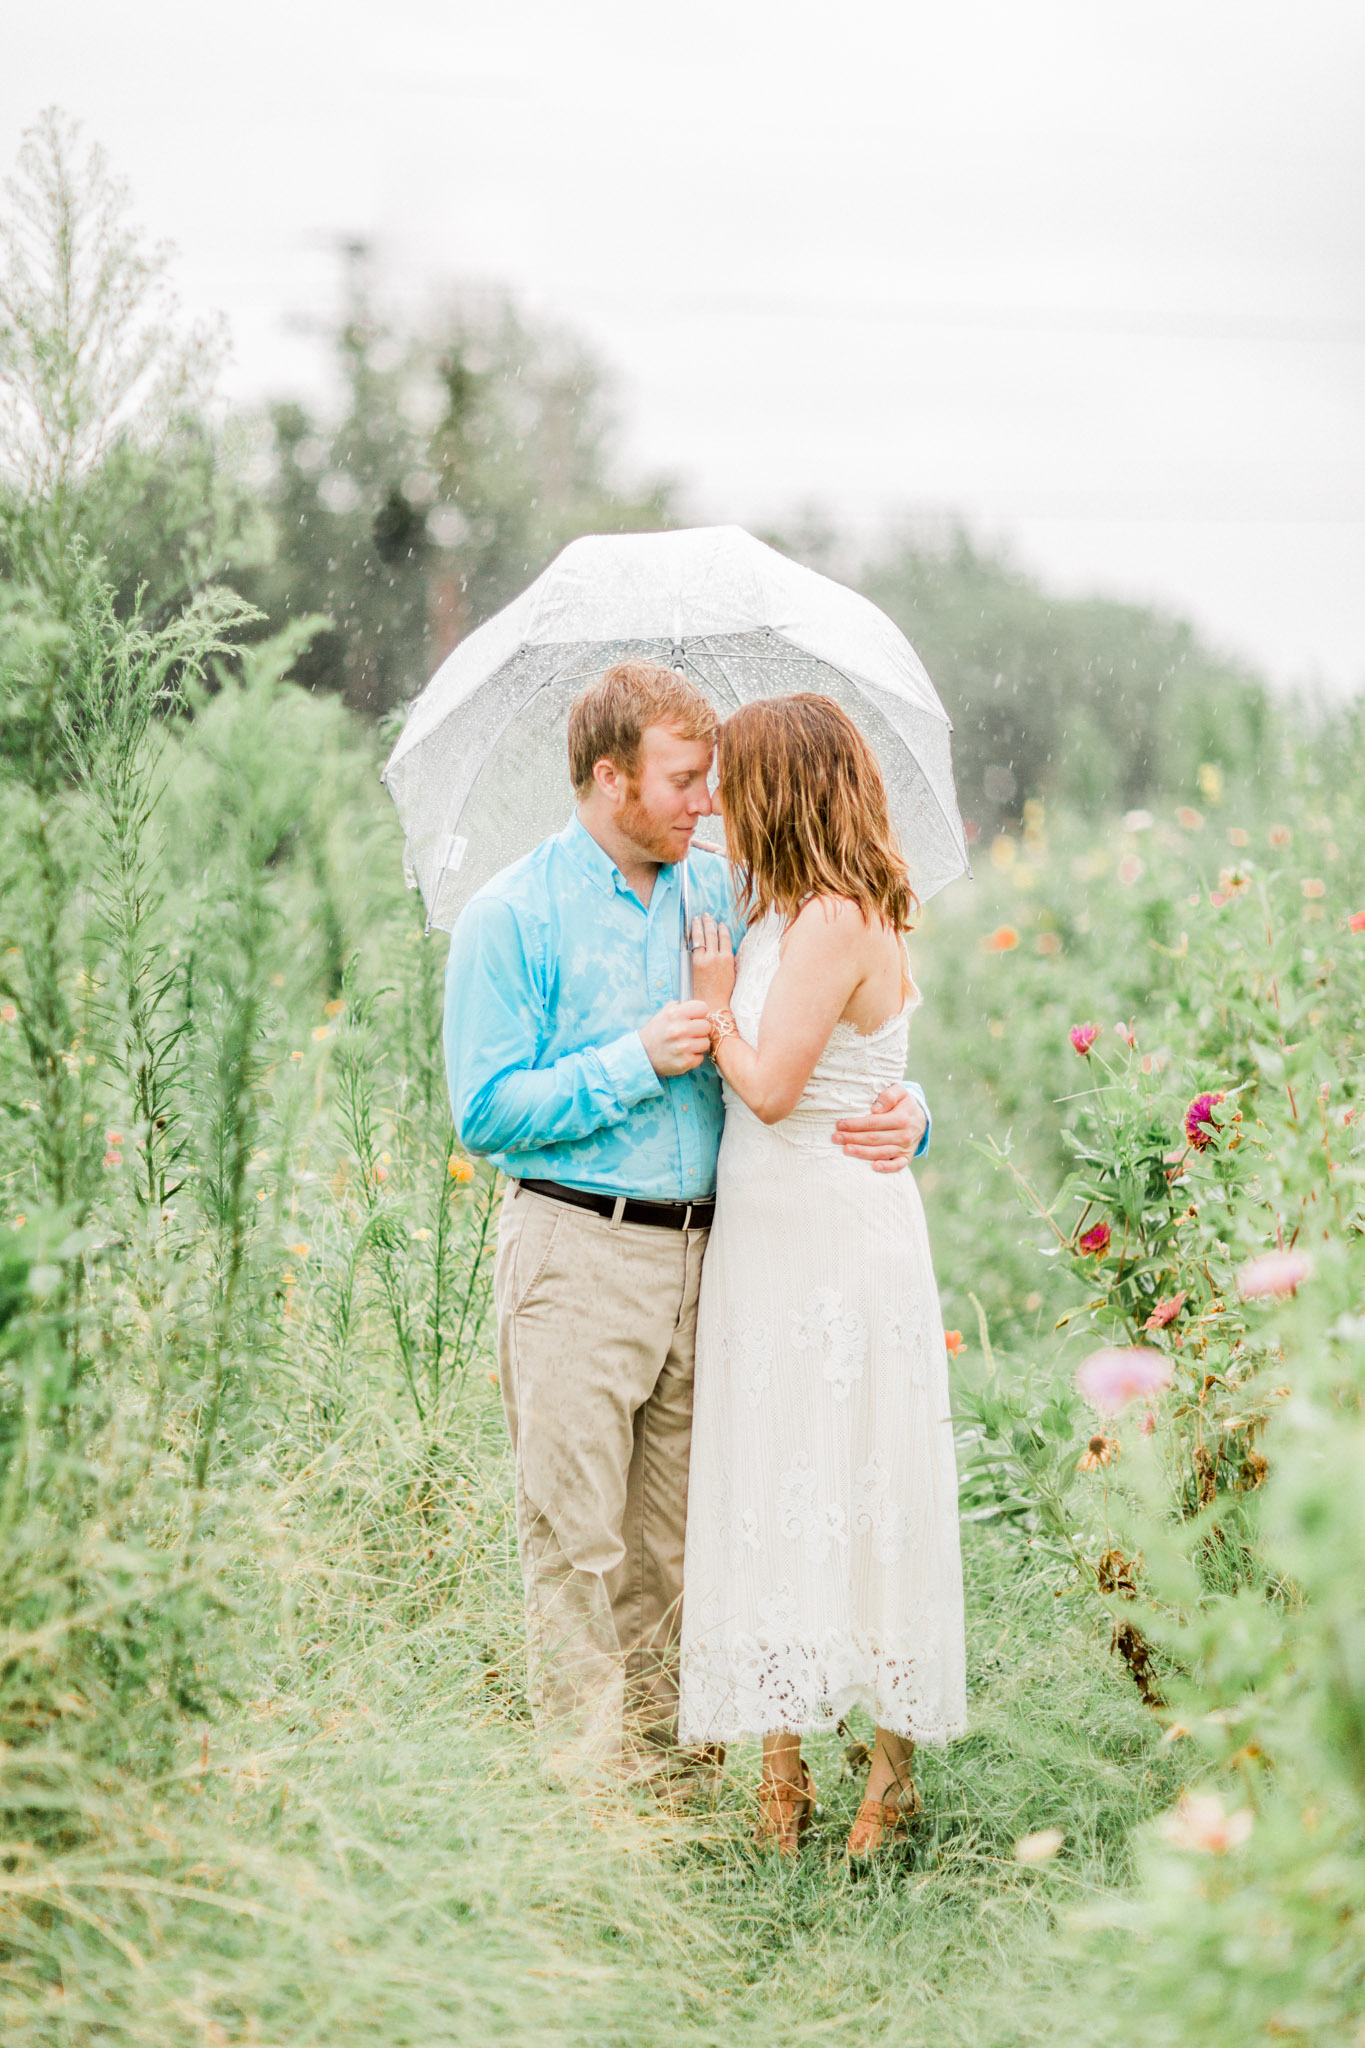 Wichita Falls, TX Engagement Photos - Garden Photography